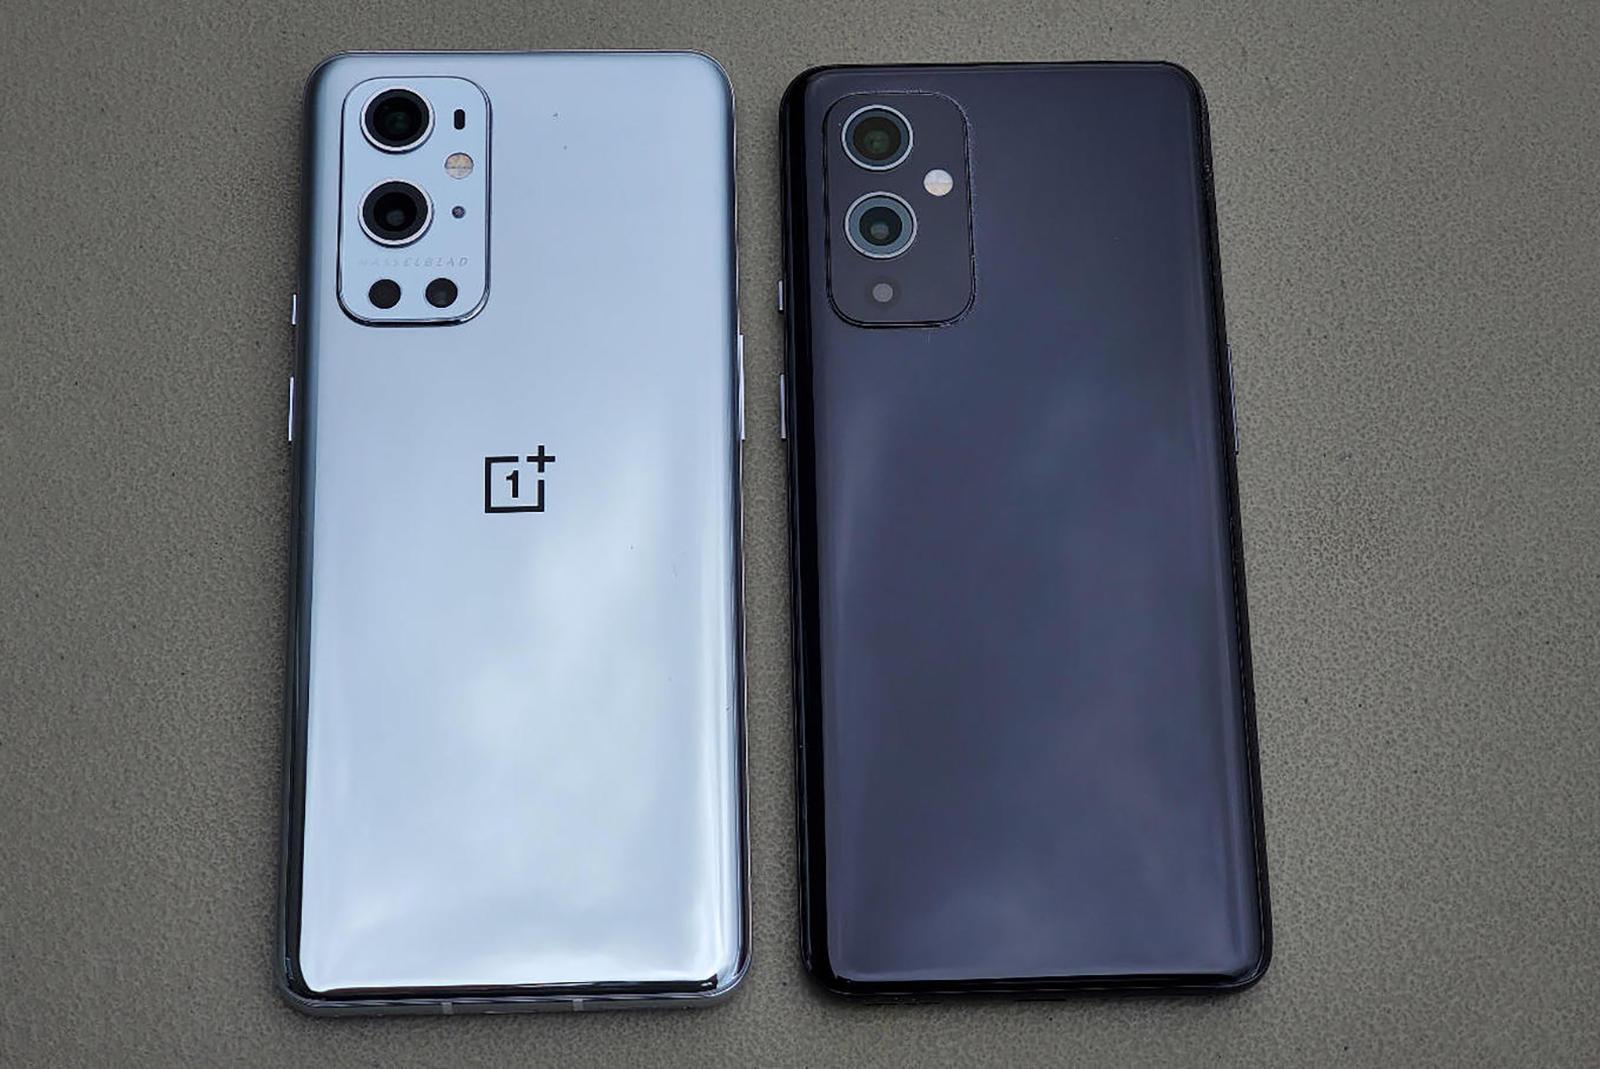 best-5g-phone-galaxy-note-20-ultra-2-review.jpg